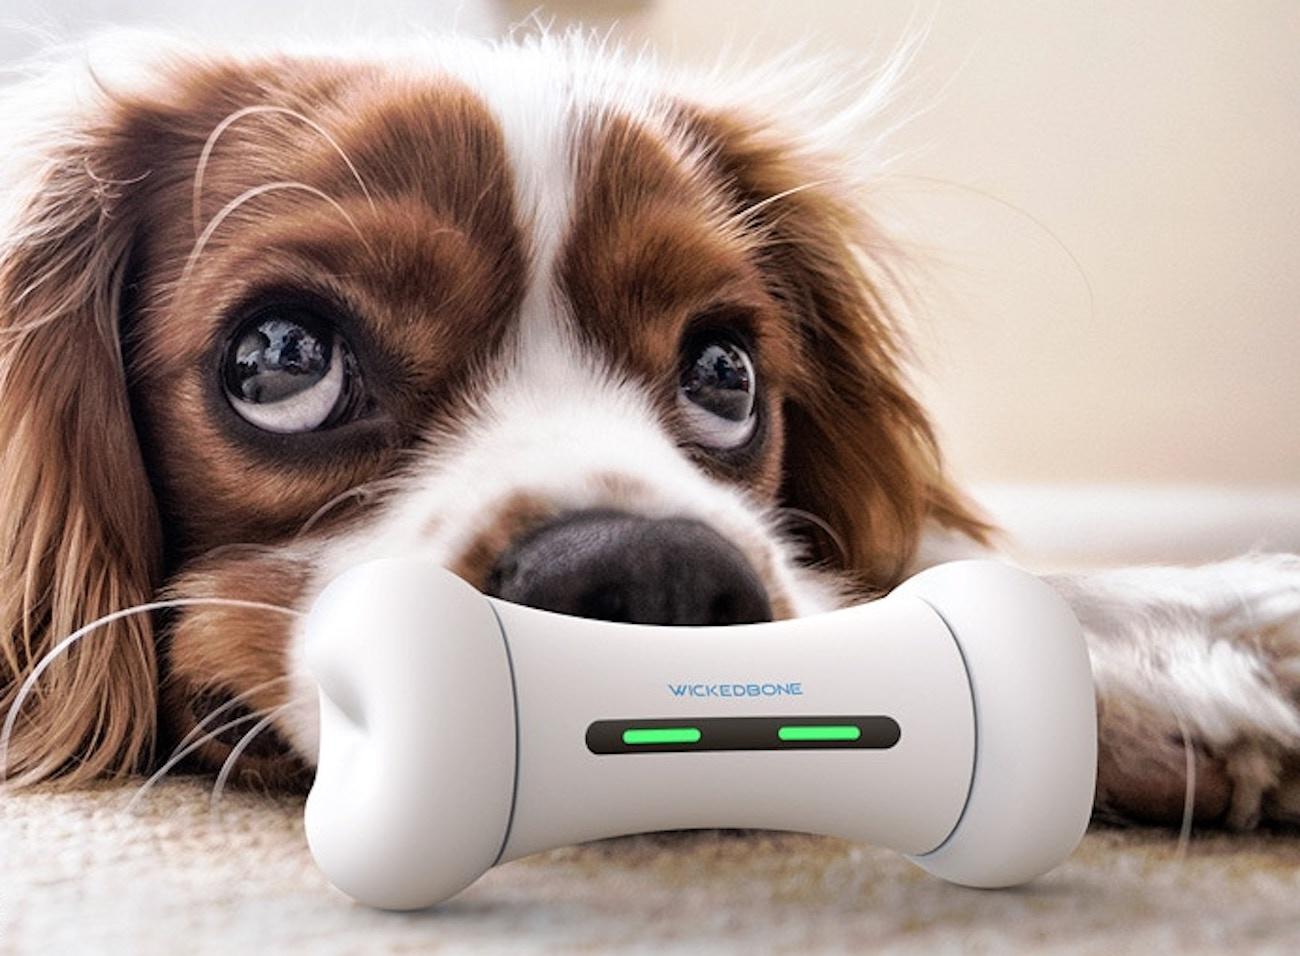 Wickedbone Smart Interactive Dog Toy